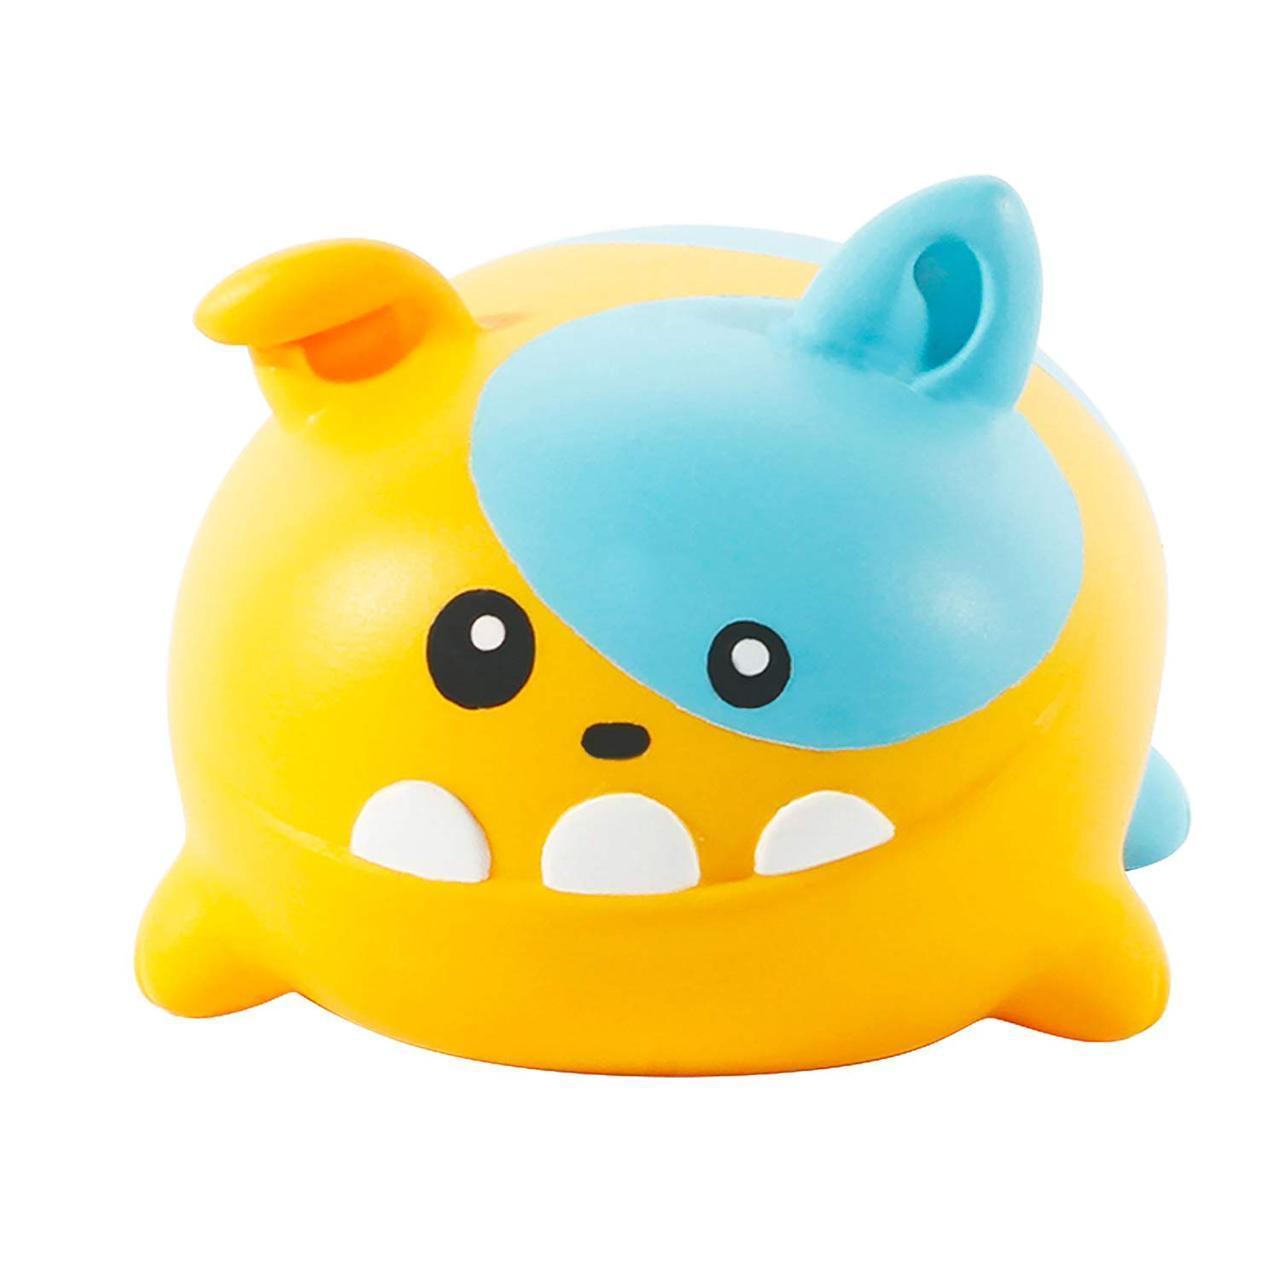 Музыкальная игрушка-нотка Silly Squeaks - Слурп До (39645)